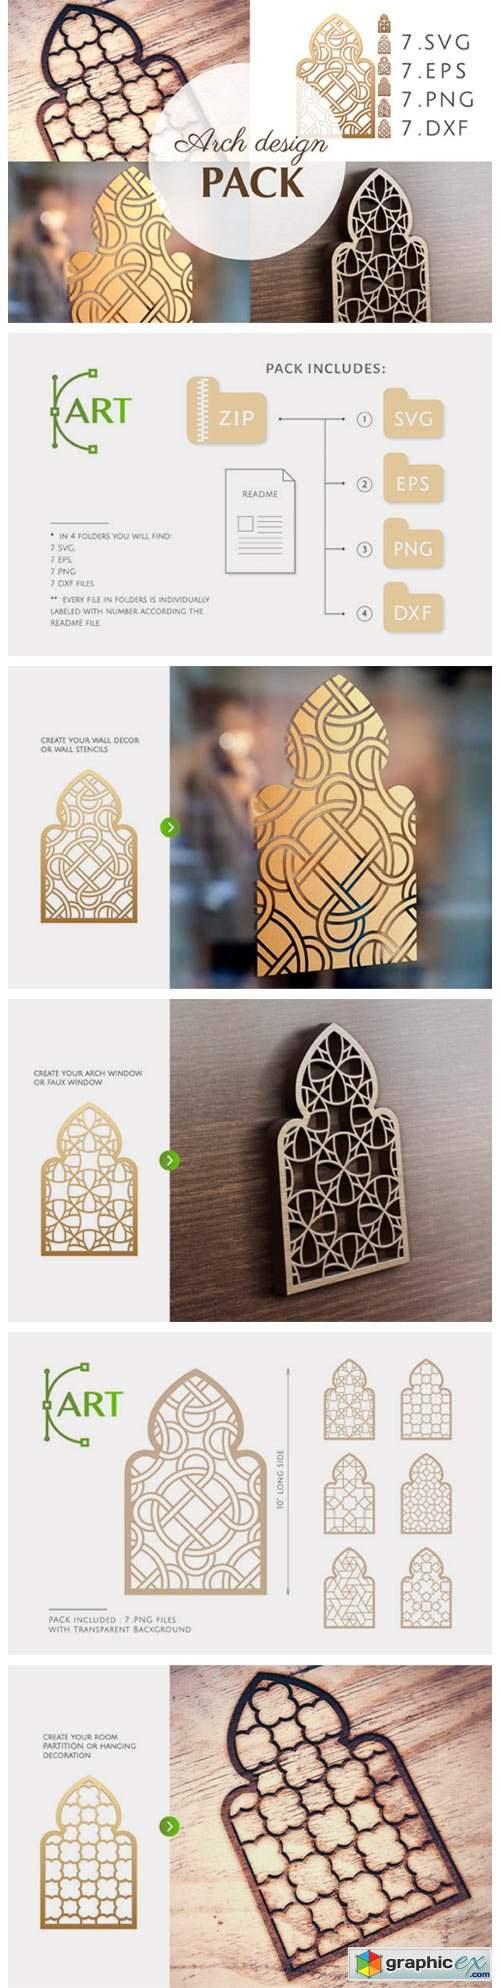 Arch Window Islam Art